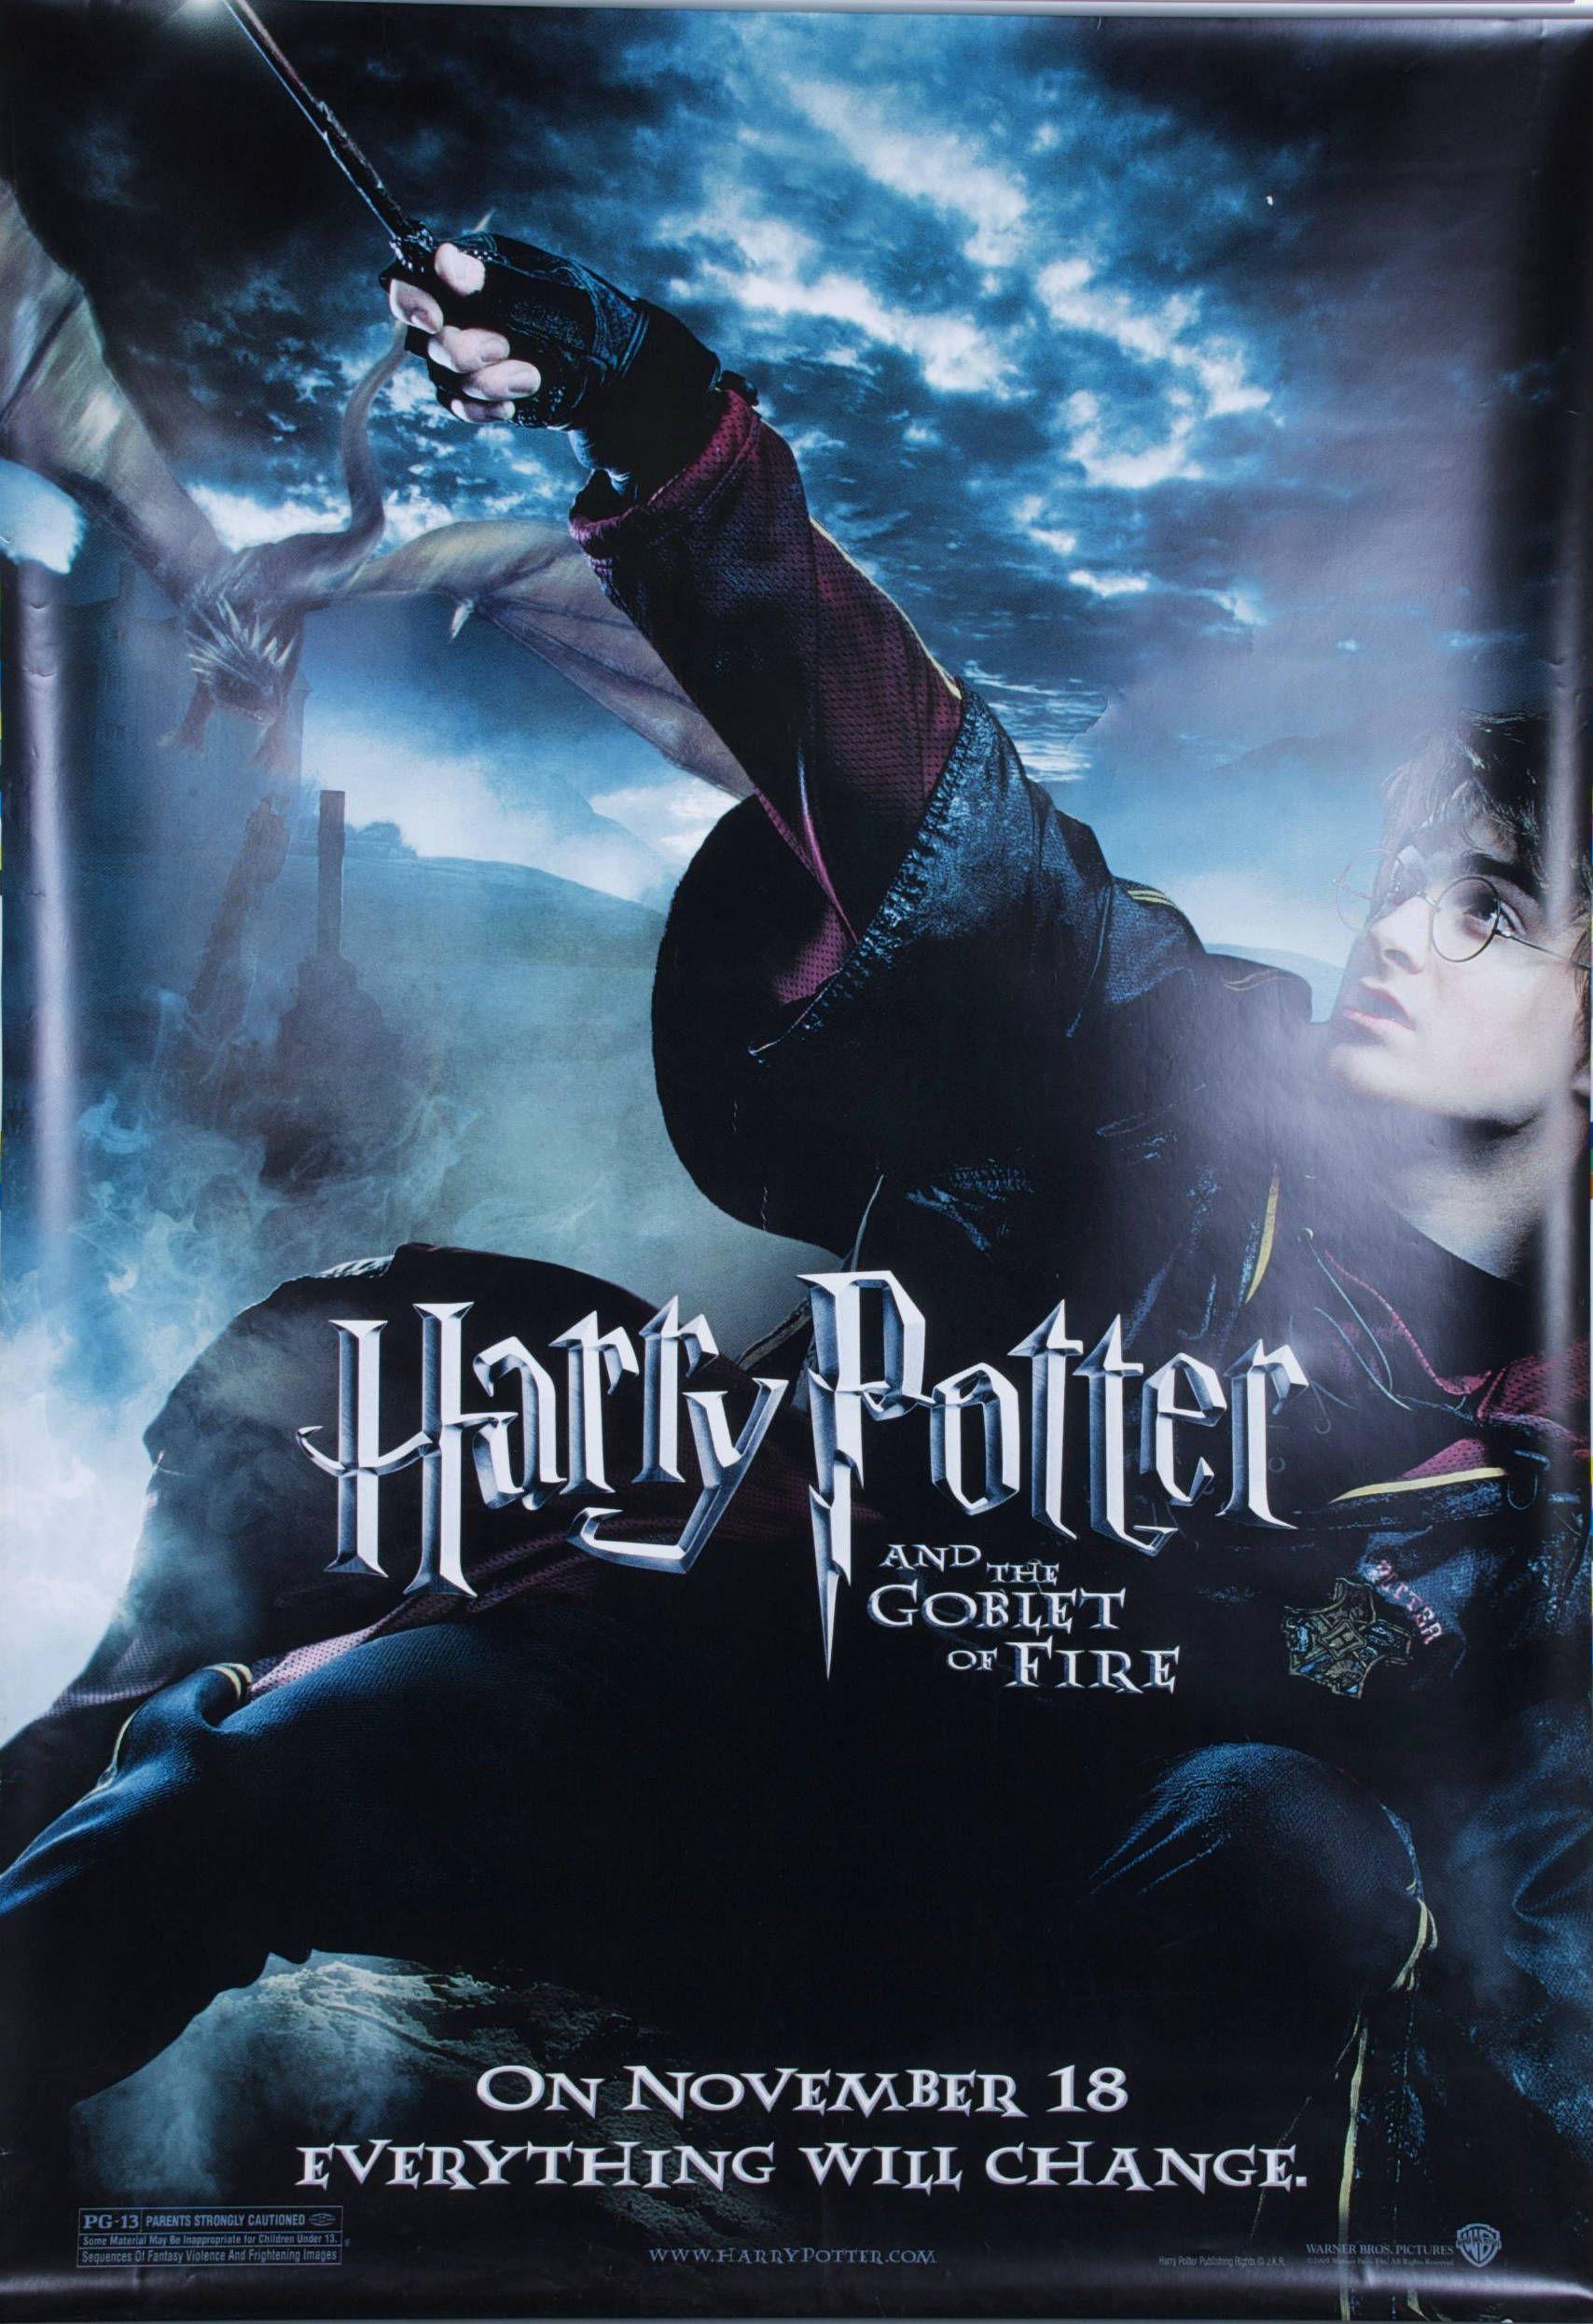 Harry Potter Goblet Of Fire Poster Poster Vintage Posters Harry Potter Goblet